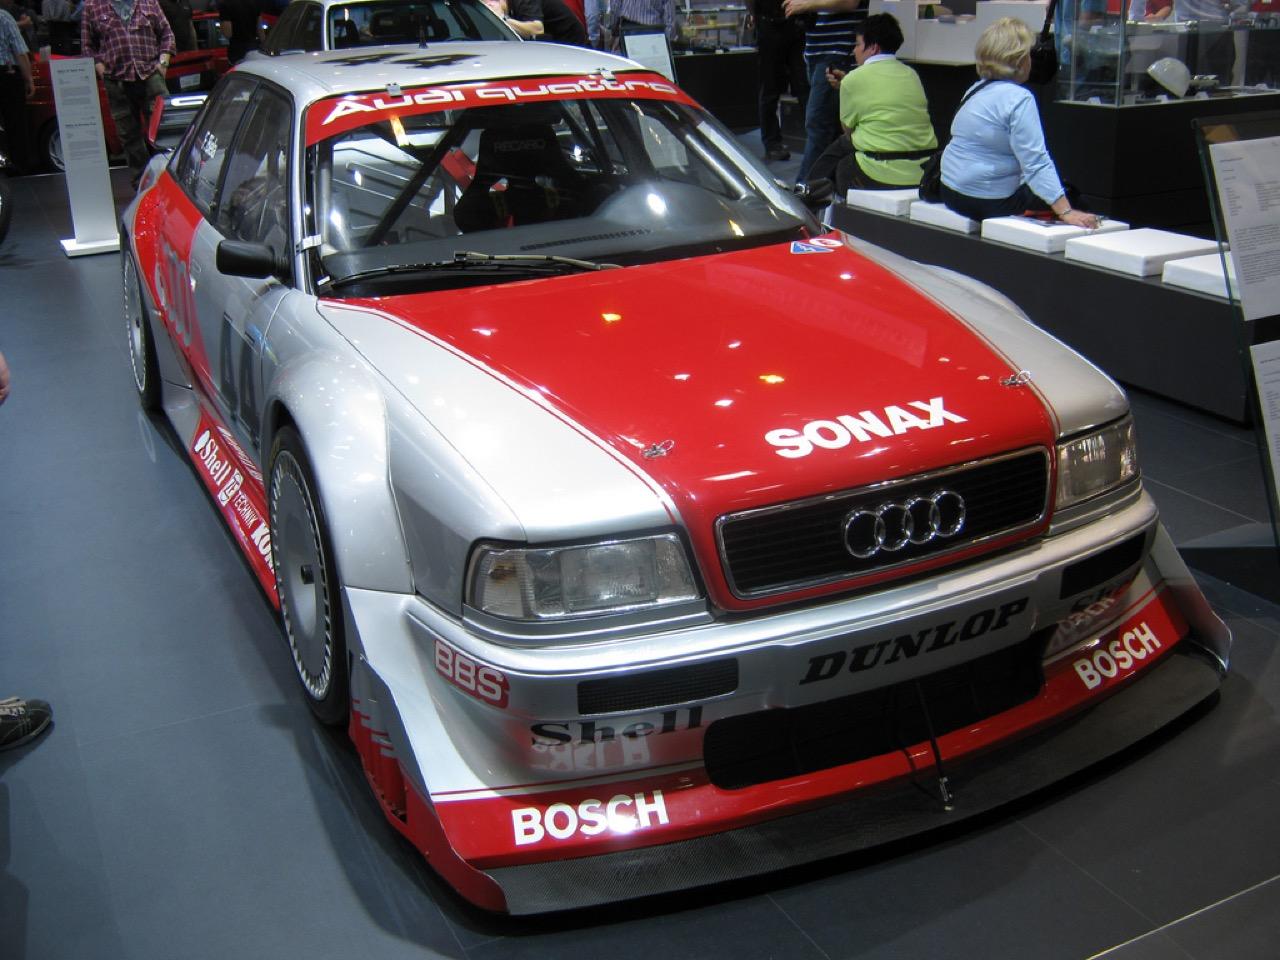 Audi 80 V6 DTM... V6 ? DTM ? C'est quoi c'bordel ?! 11